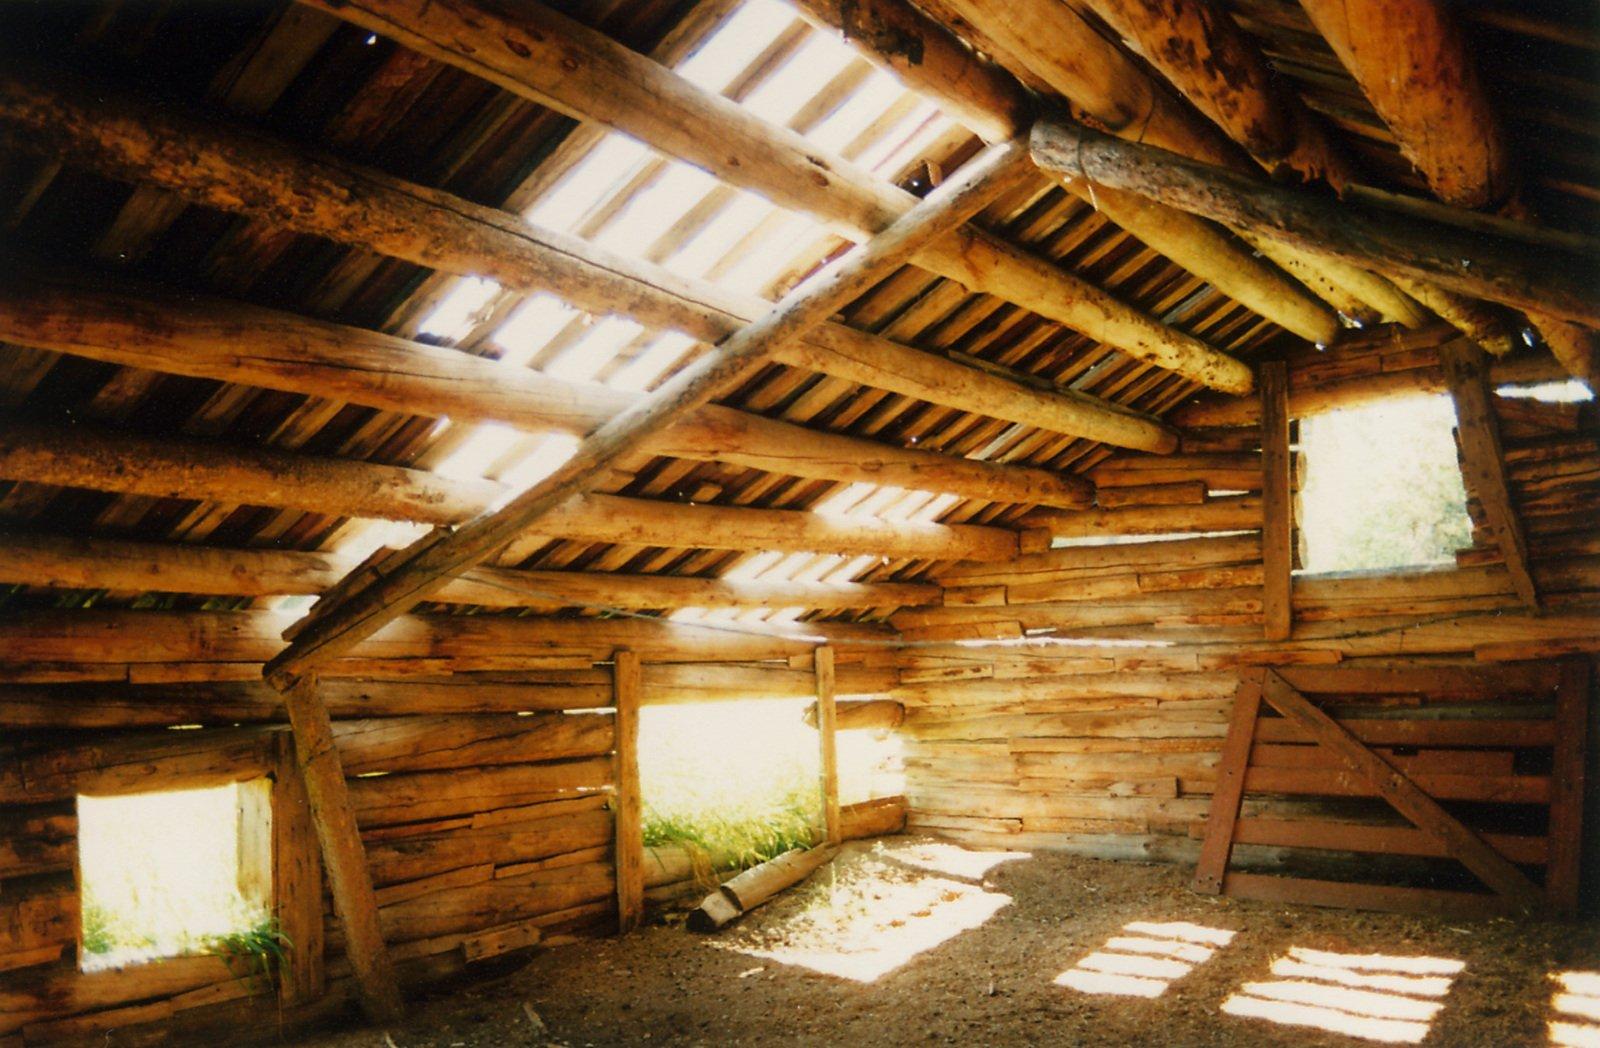 Free Sunlit Barn Stock Photo Freeimages Com